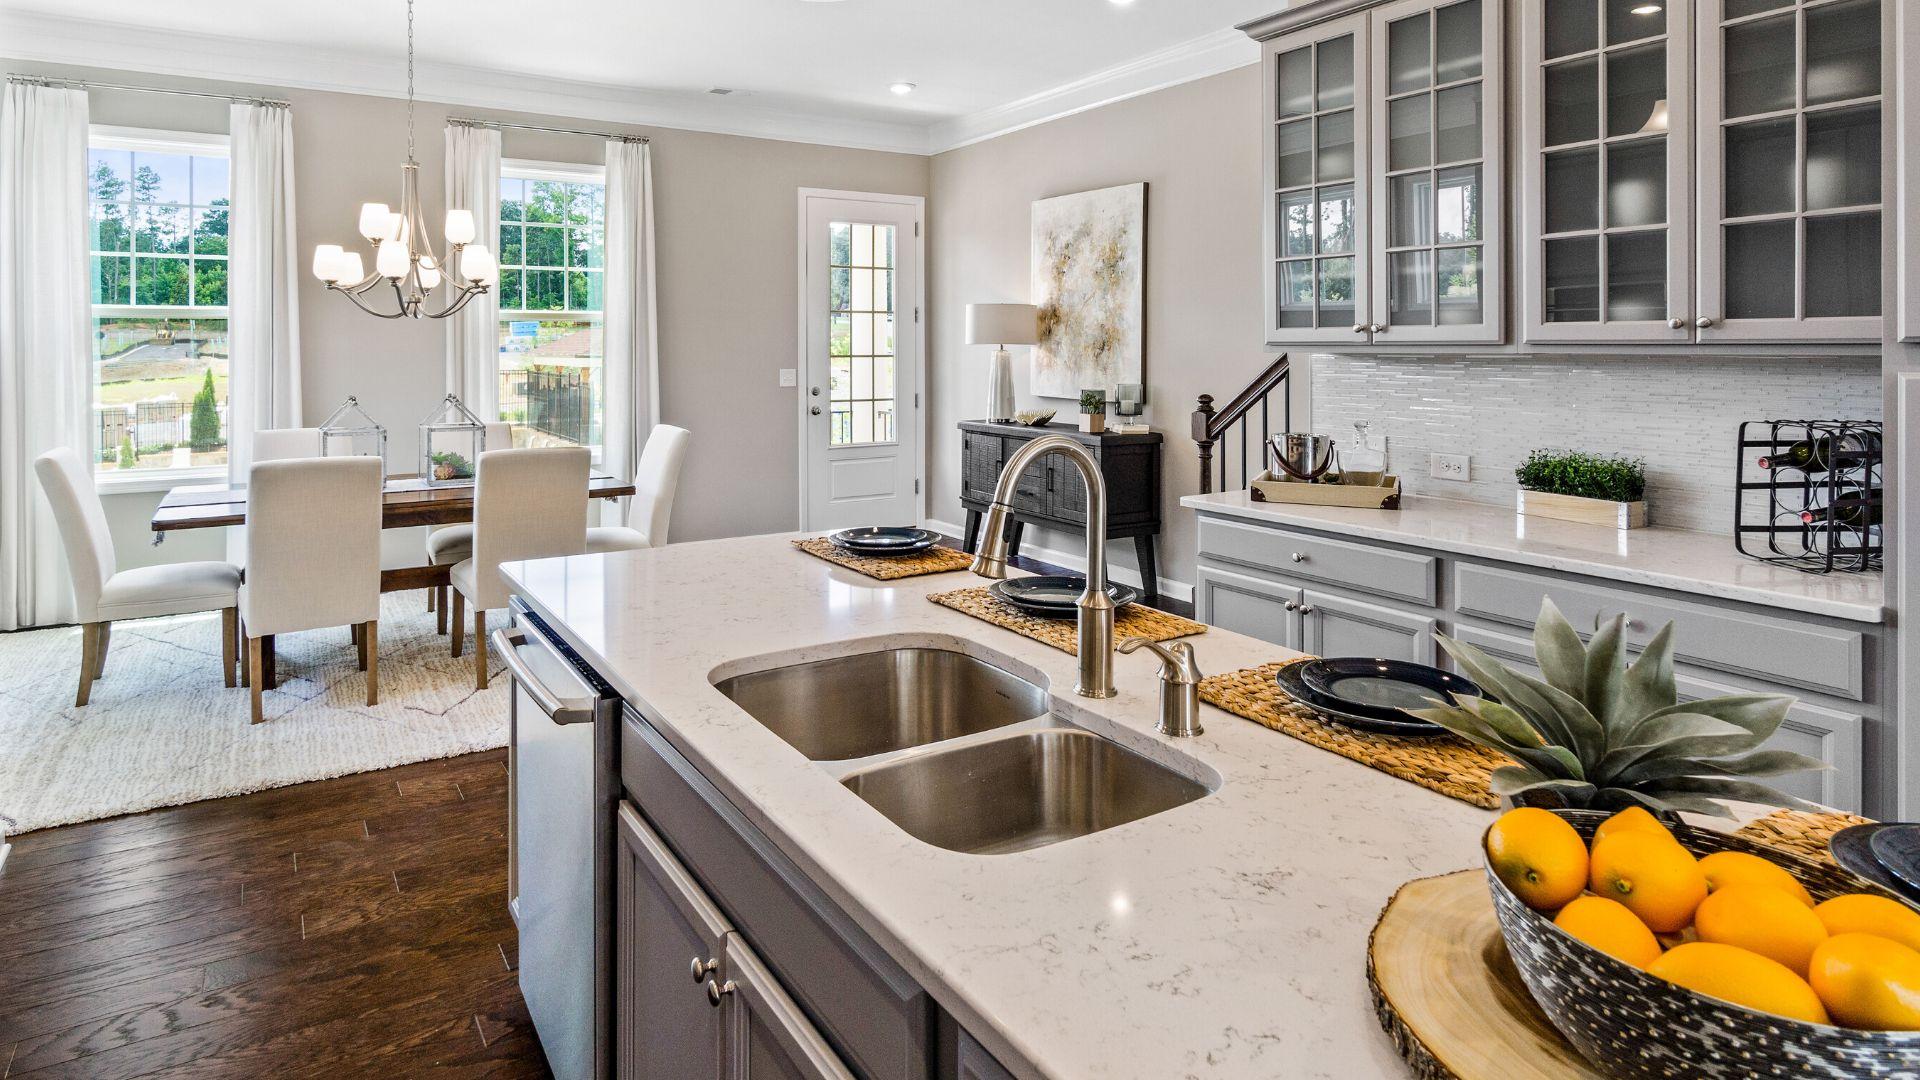 'Cumberland Station' by Lennar - Atlanta Homebuilding in Atlanta